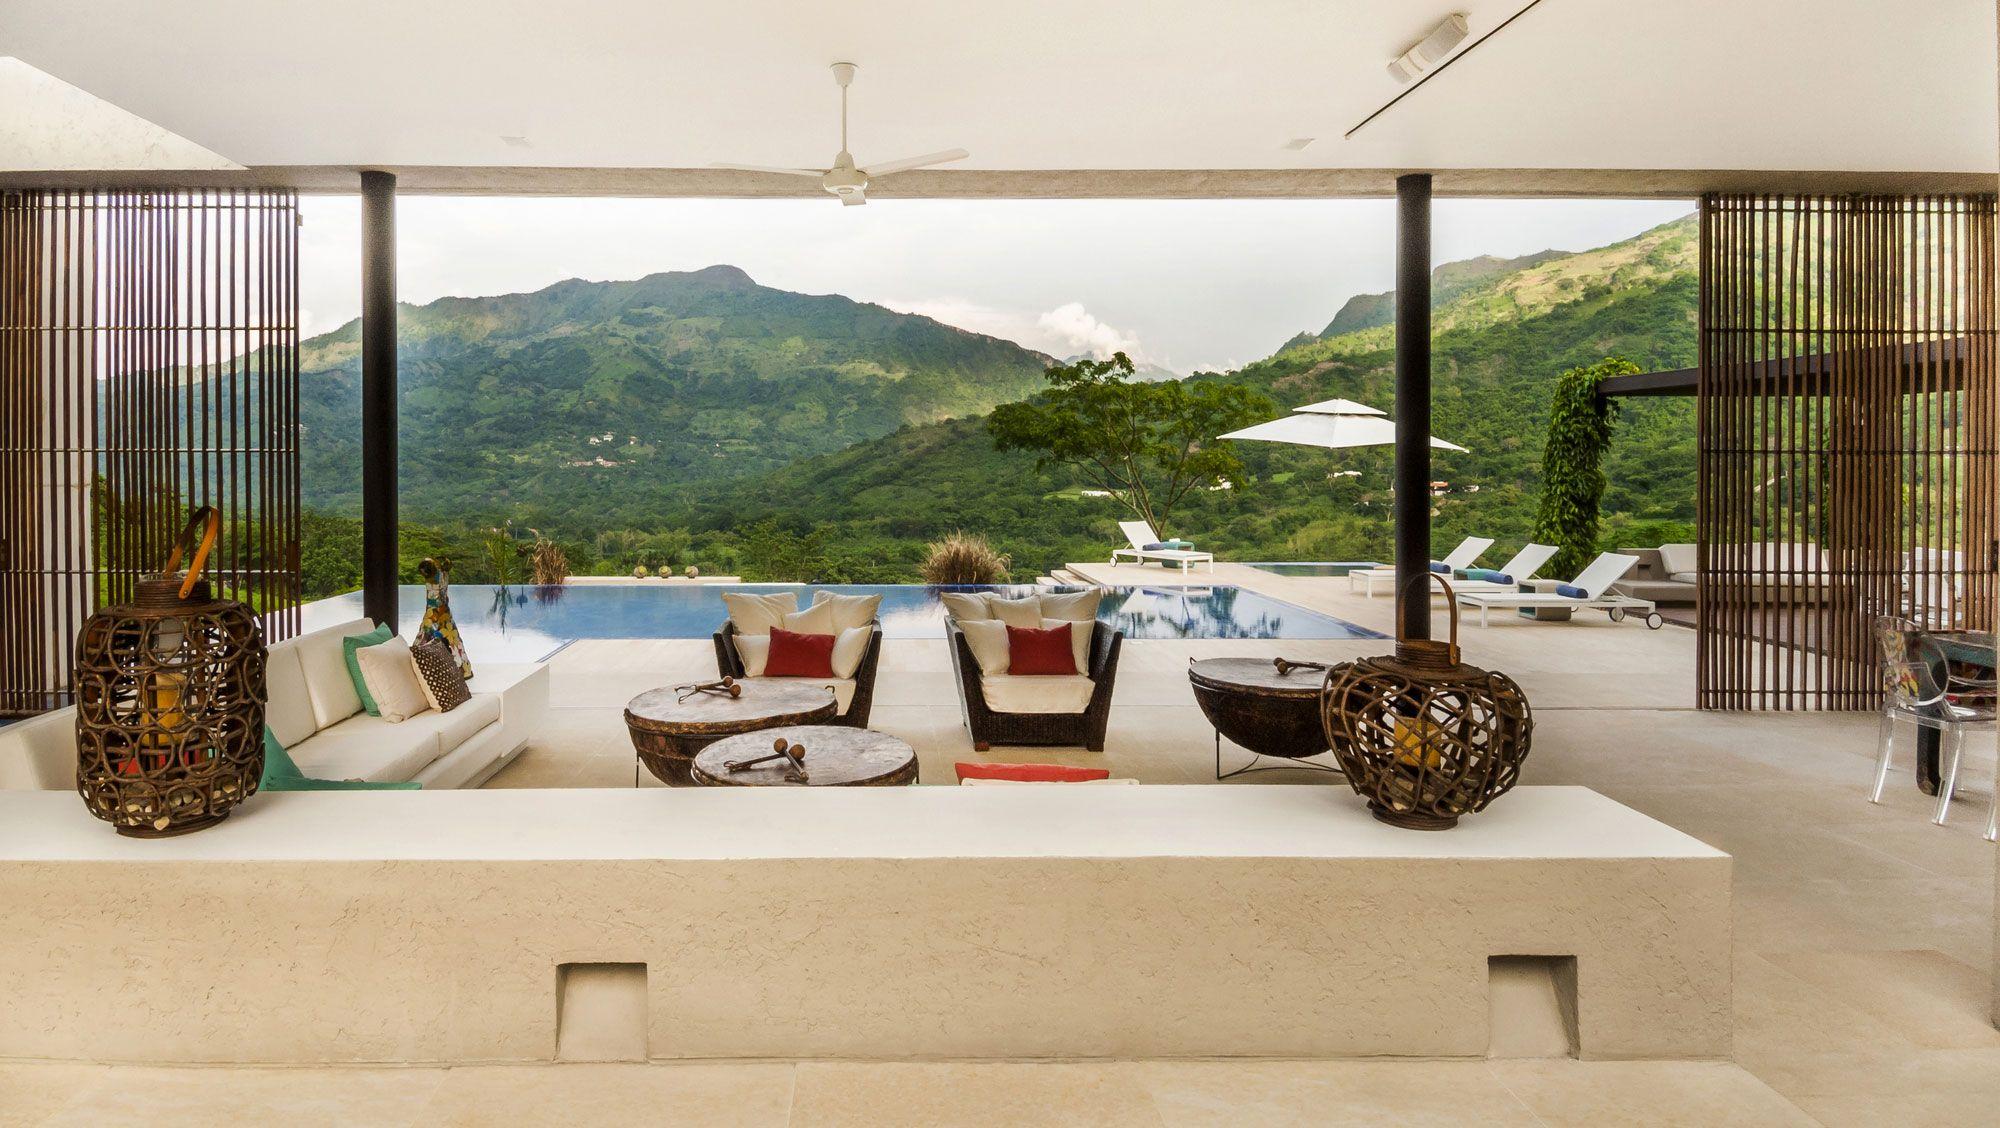 Interior aspect of House 3 in Villeta, Cundinamarca, Colombia by Arquitectura en Estudio